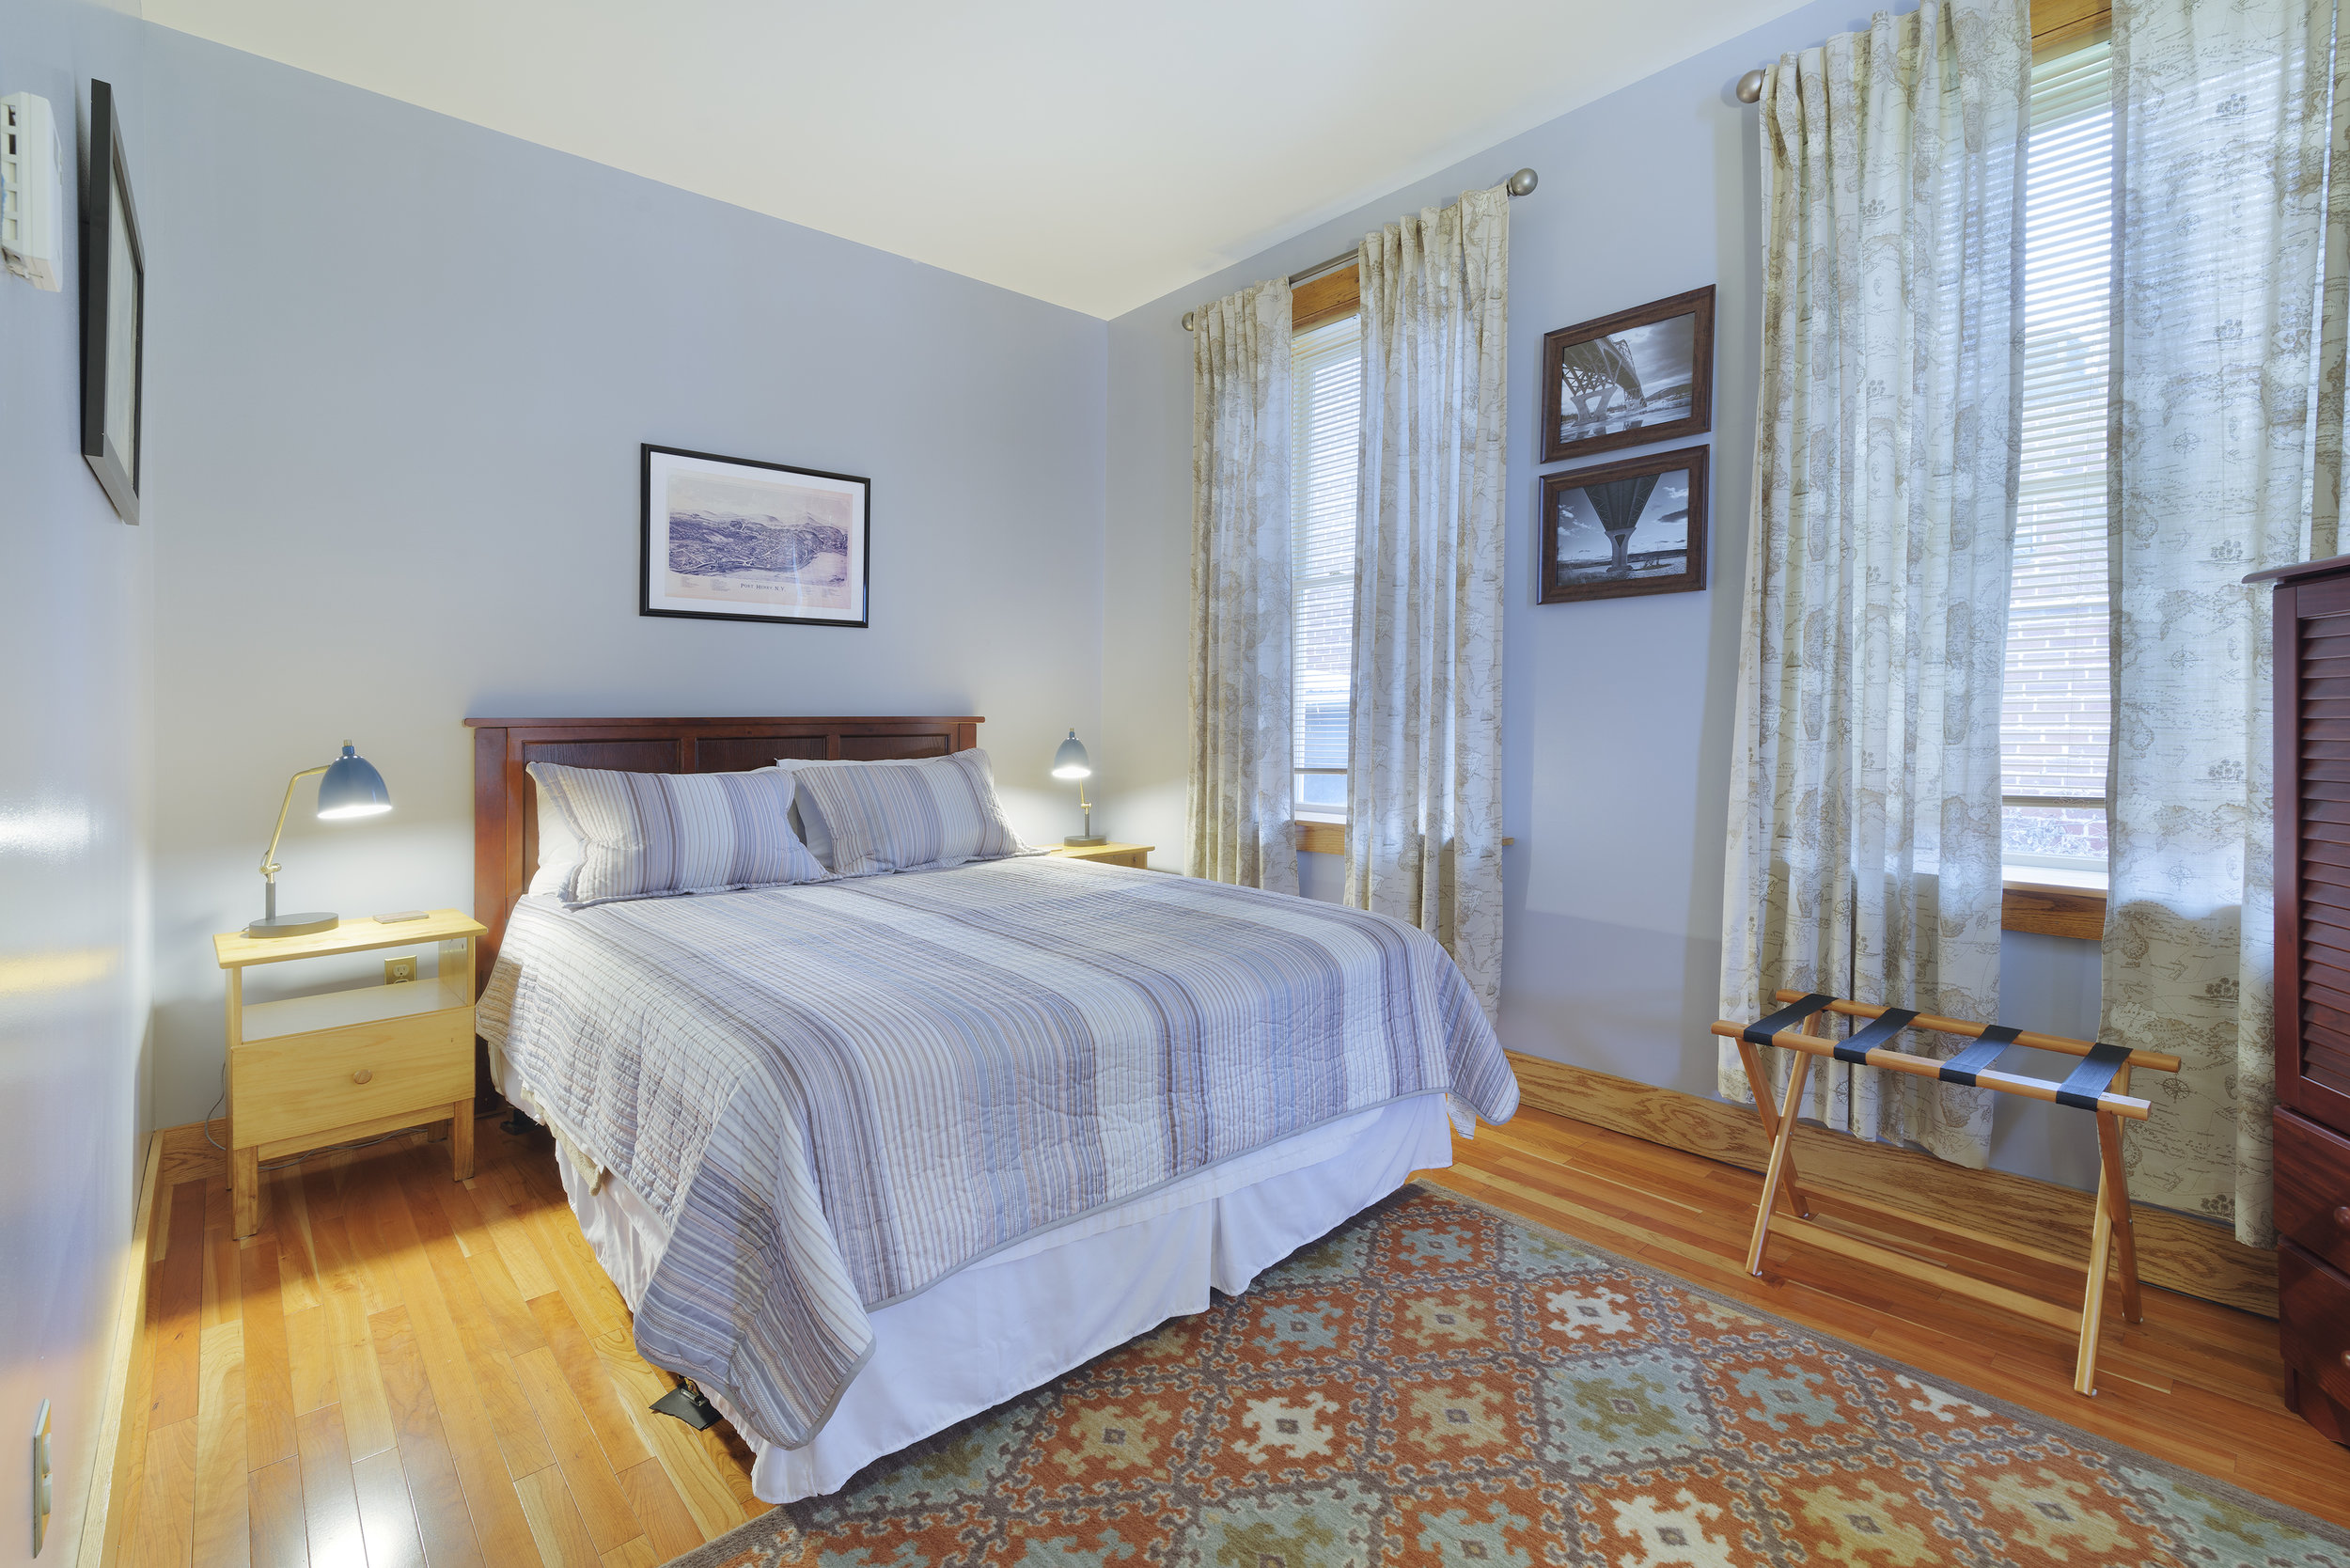 Room-204.jpg